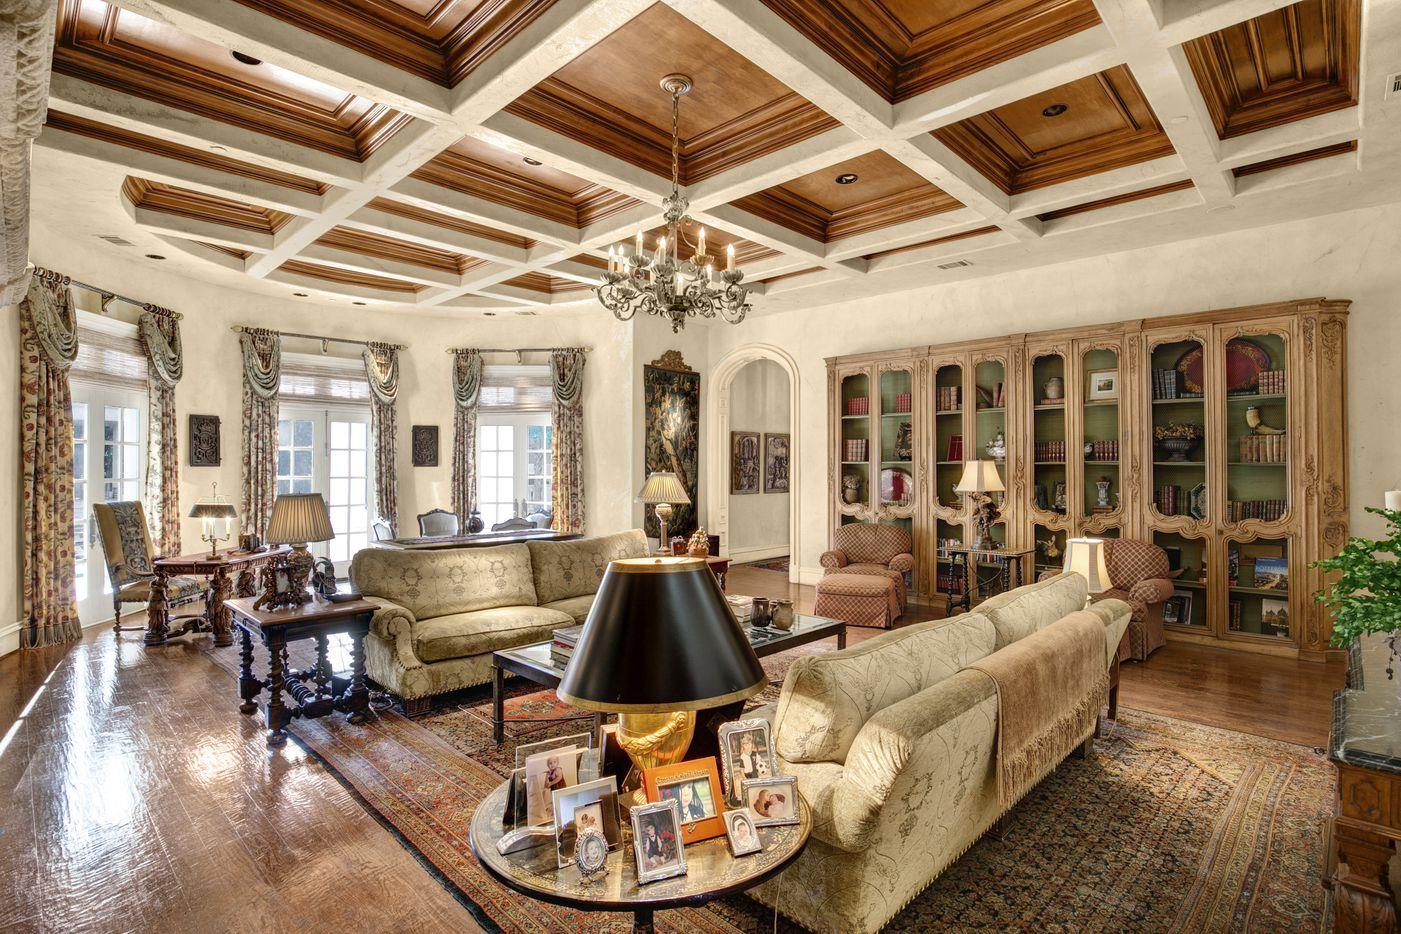 The Strait Lane home has more than 16,000 square feet.